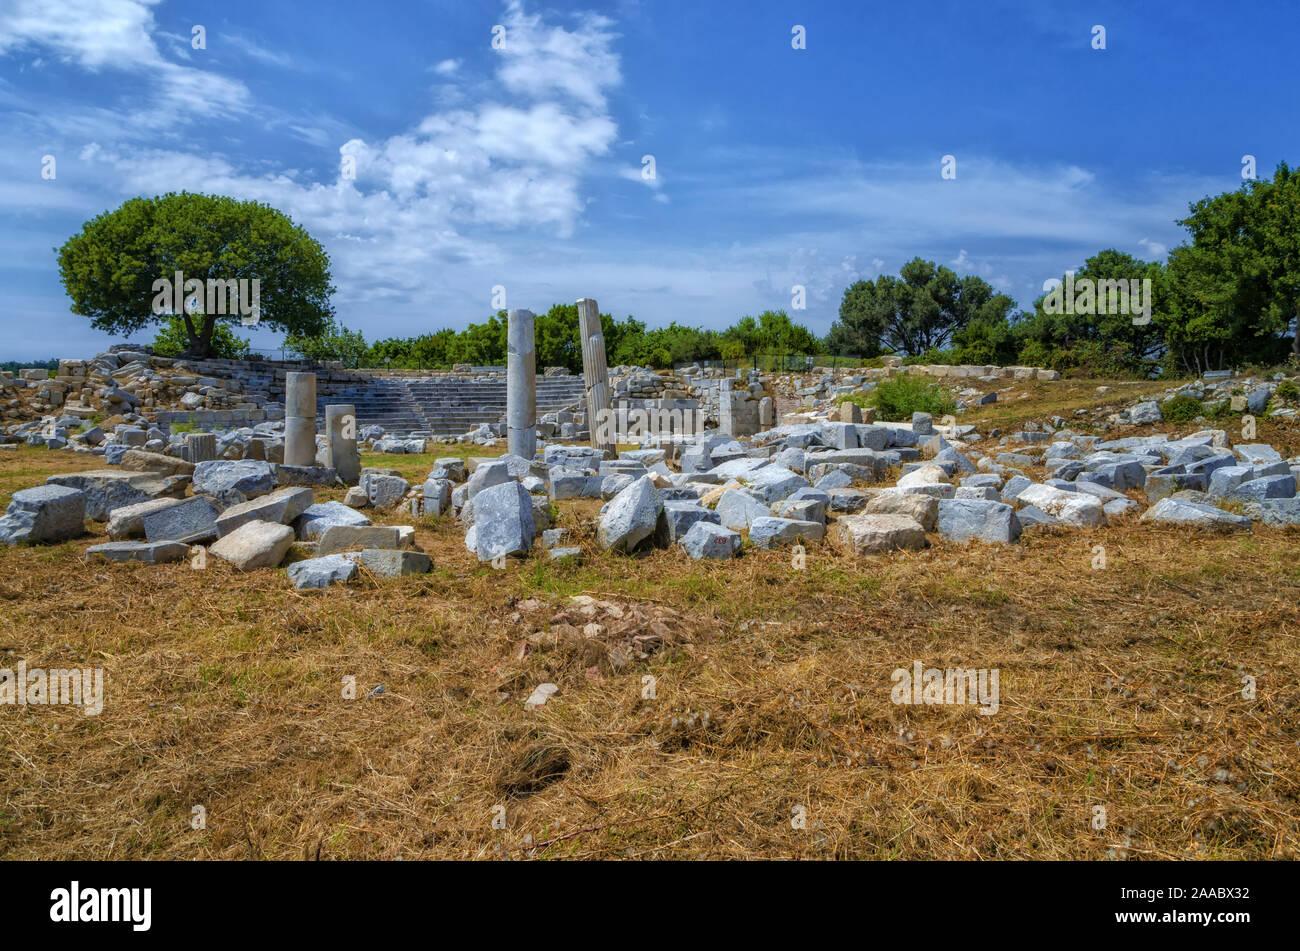 Ruins Of Teos Ancient City Sigacik Seferihisar Izmir Turkey Stock Photo Alamy